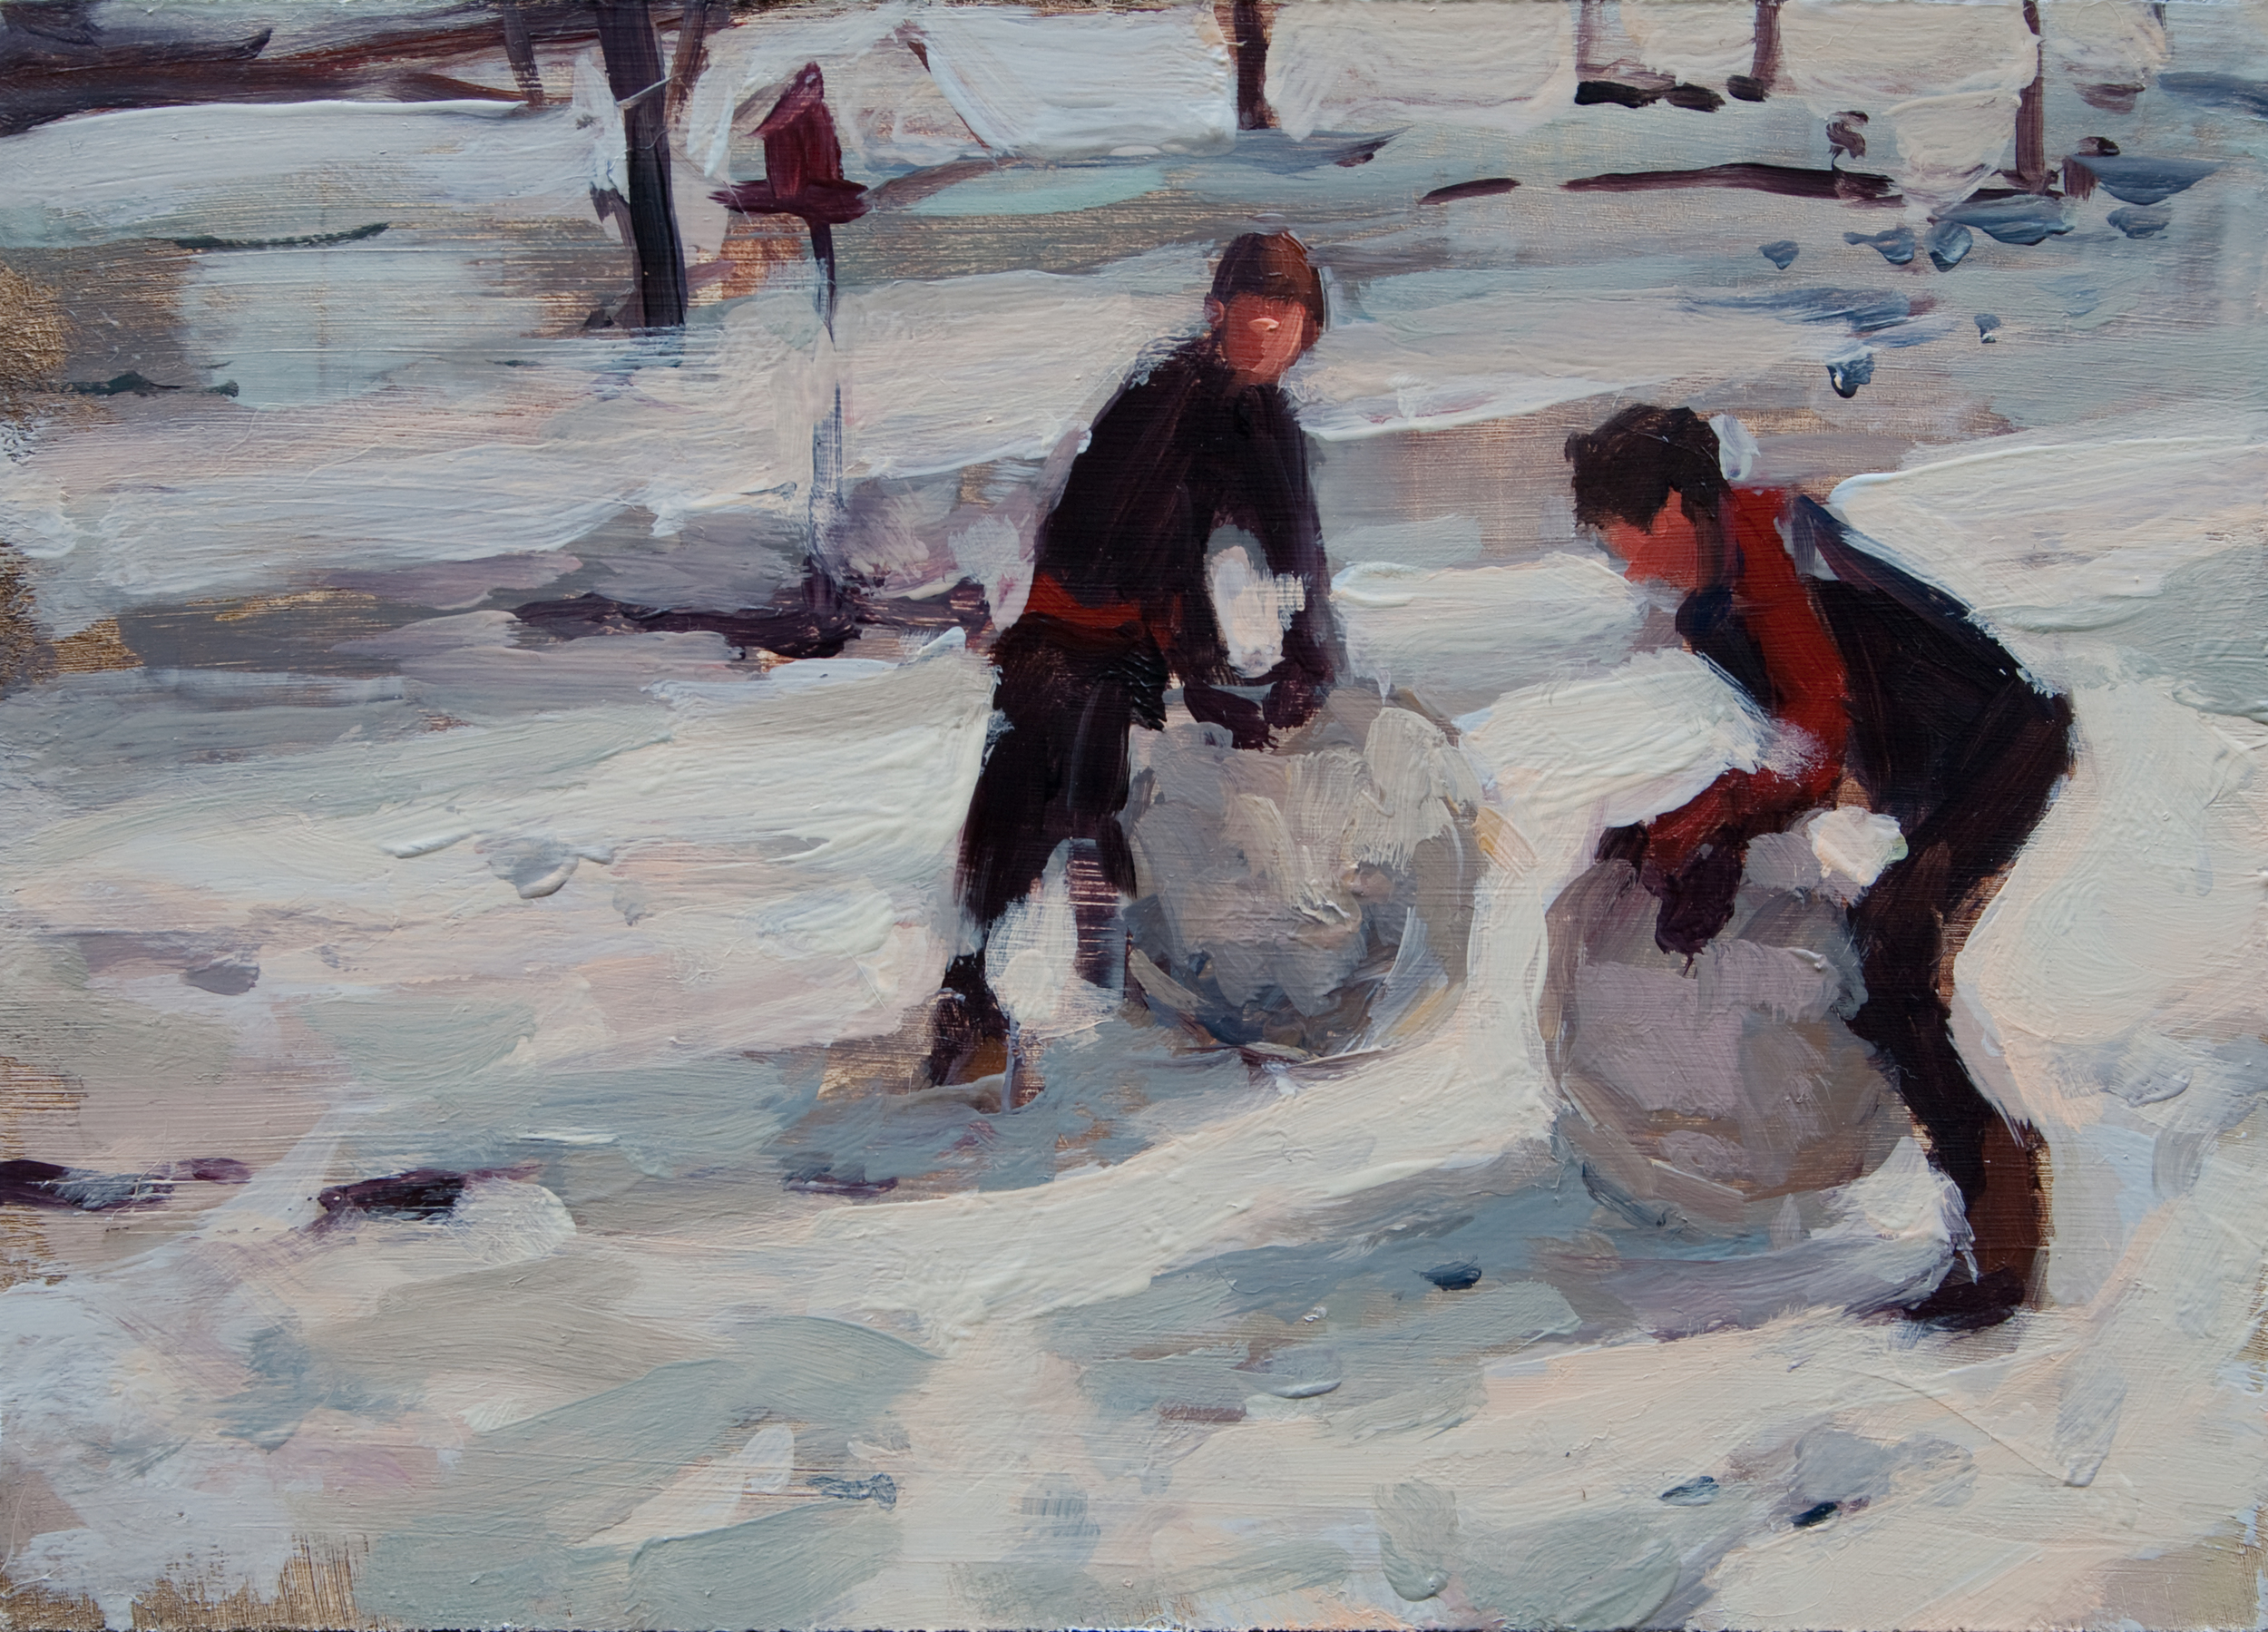 "Snow Day oil on panel, 5"" x 7"", 2012"